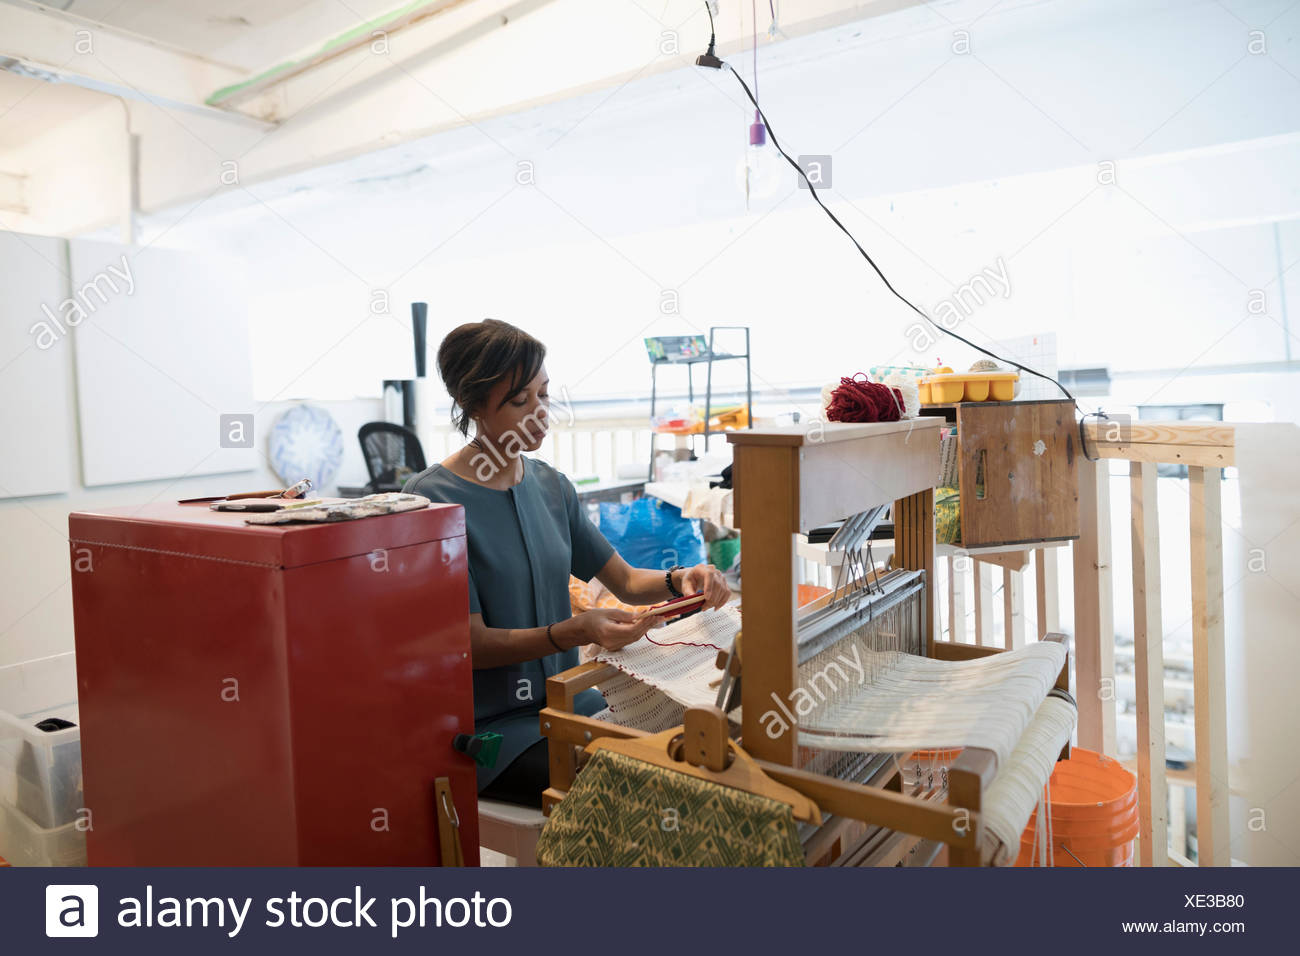 Mujer tejiendo en telar tejedor en art studio Imagen De Stock